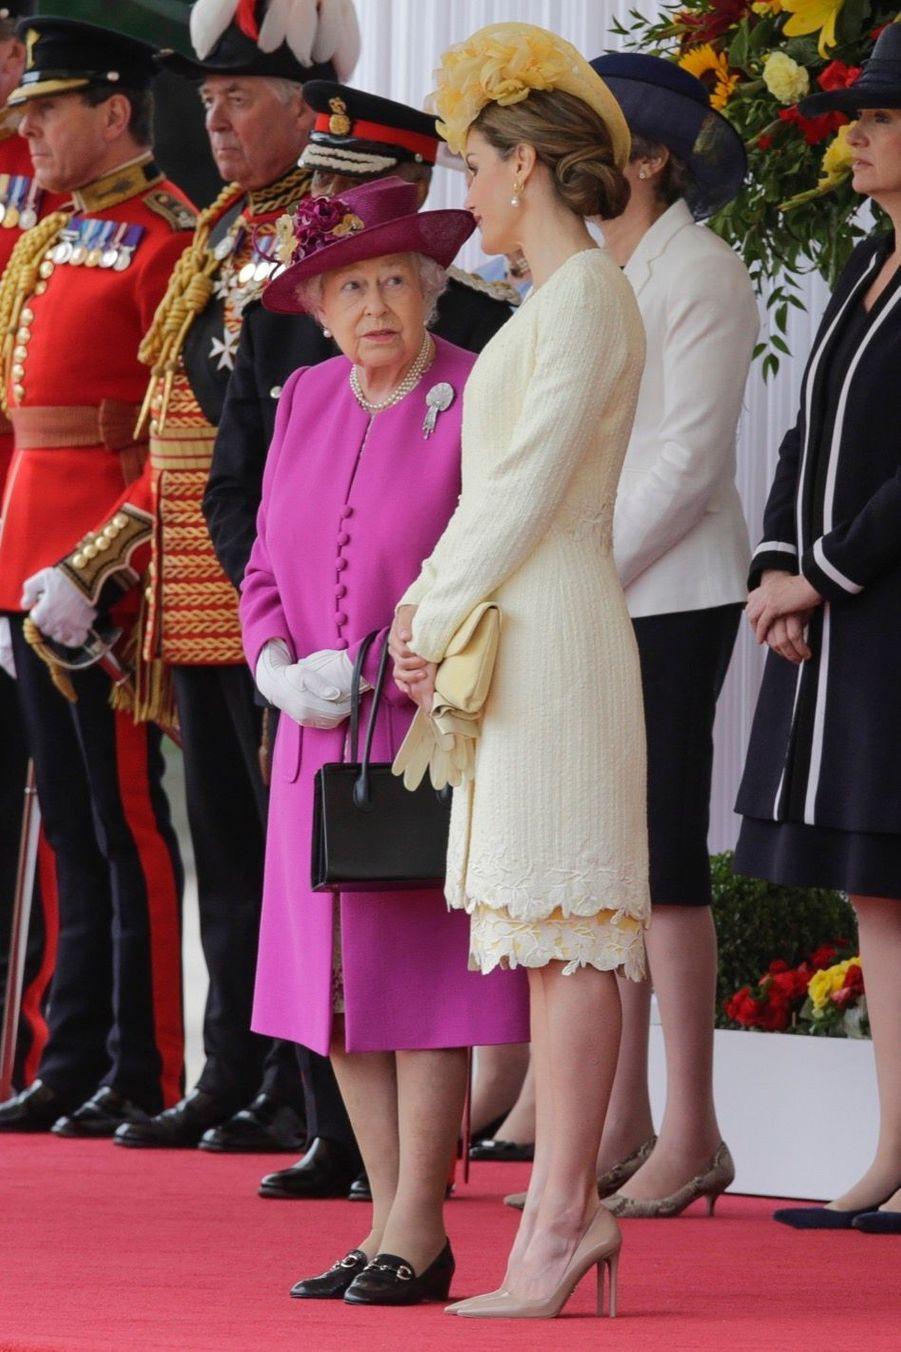 Letizia Et Felipe En Visite Chez La Reine Elizabeth II 22